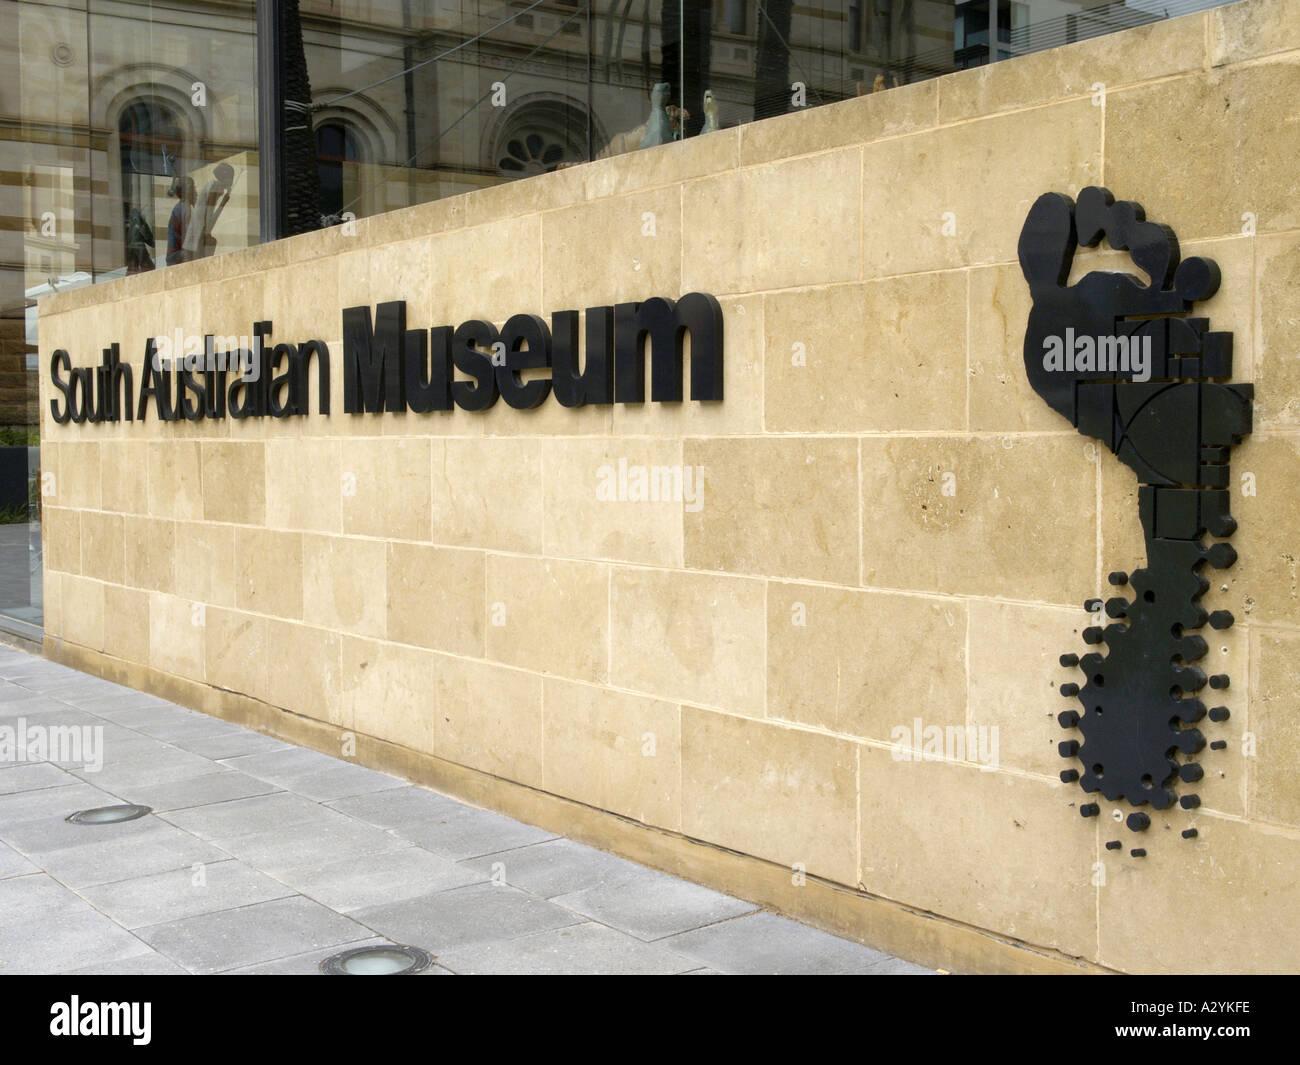 SOUTH AUSTRALIAN MUSEUM NORTH TERRACE ADELAIDE SOUTH AUSTRALIA Stock ...